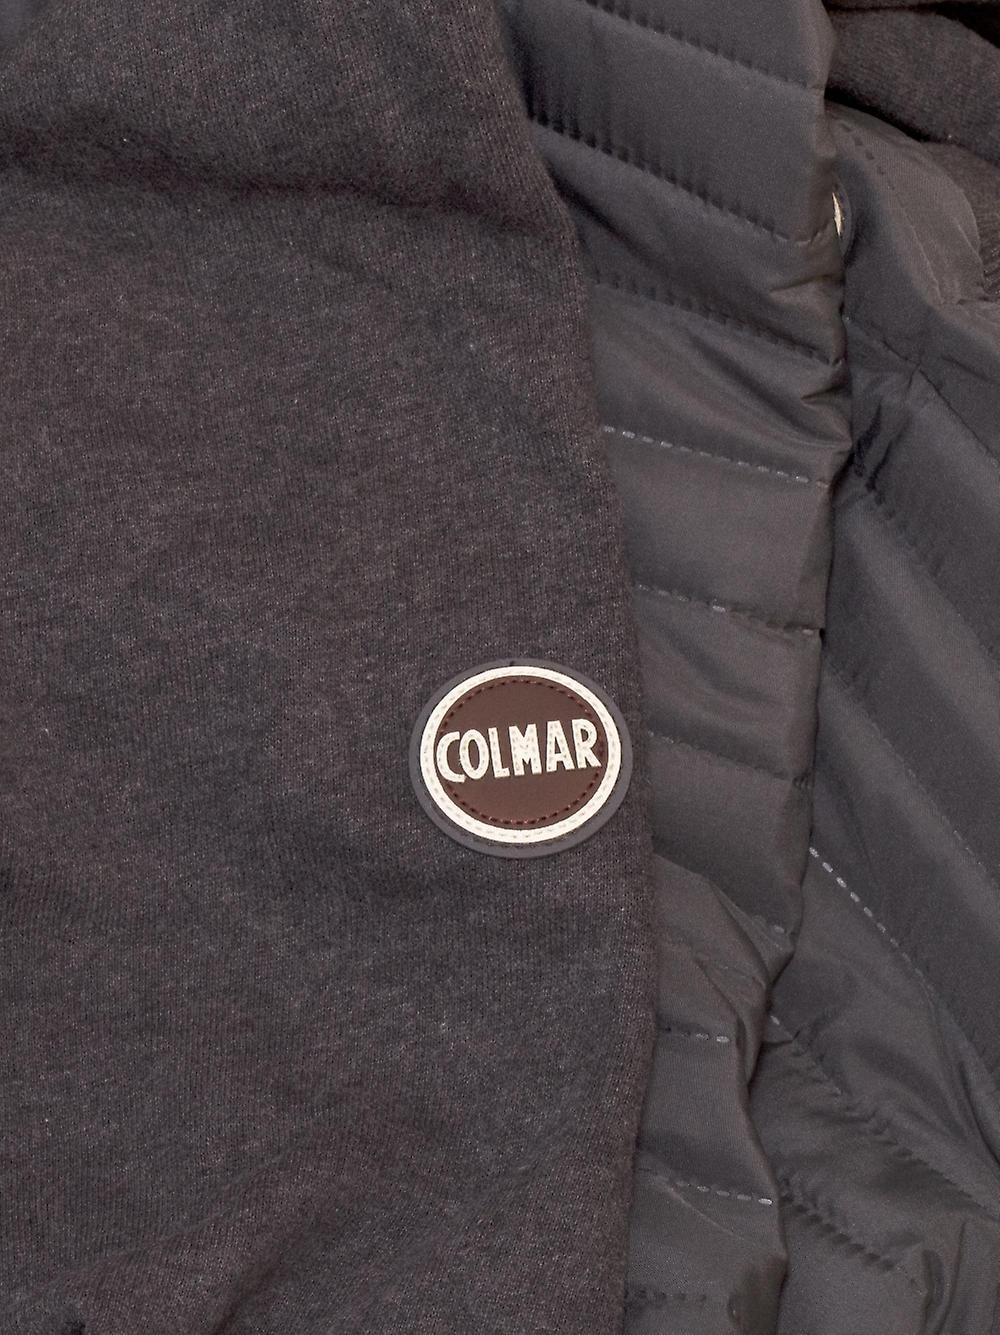 Colmar Colmar Ultrasonic Raglan Sleeve Grey Down Jacket